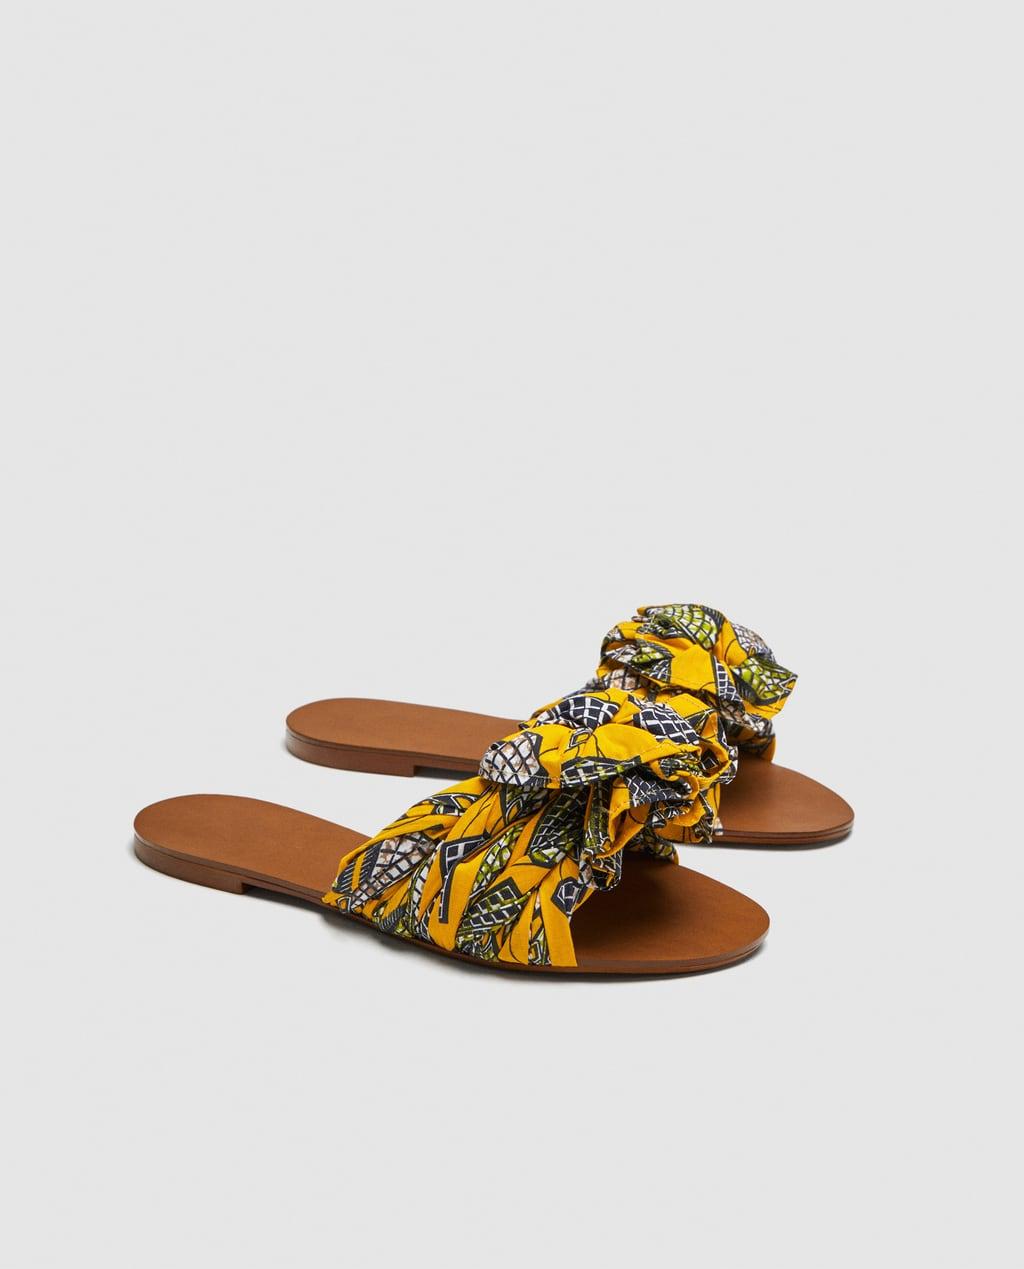 Printed Fabric Summer Slides